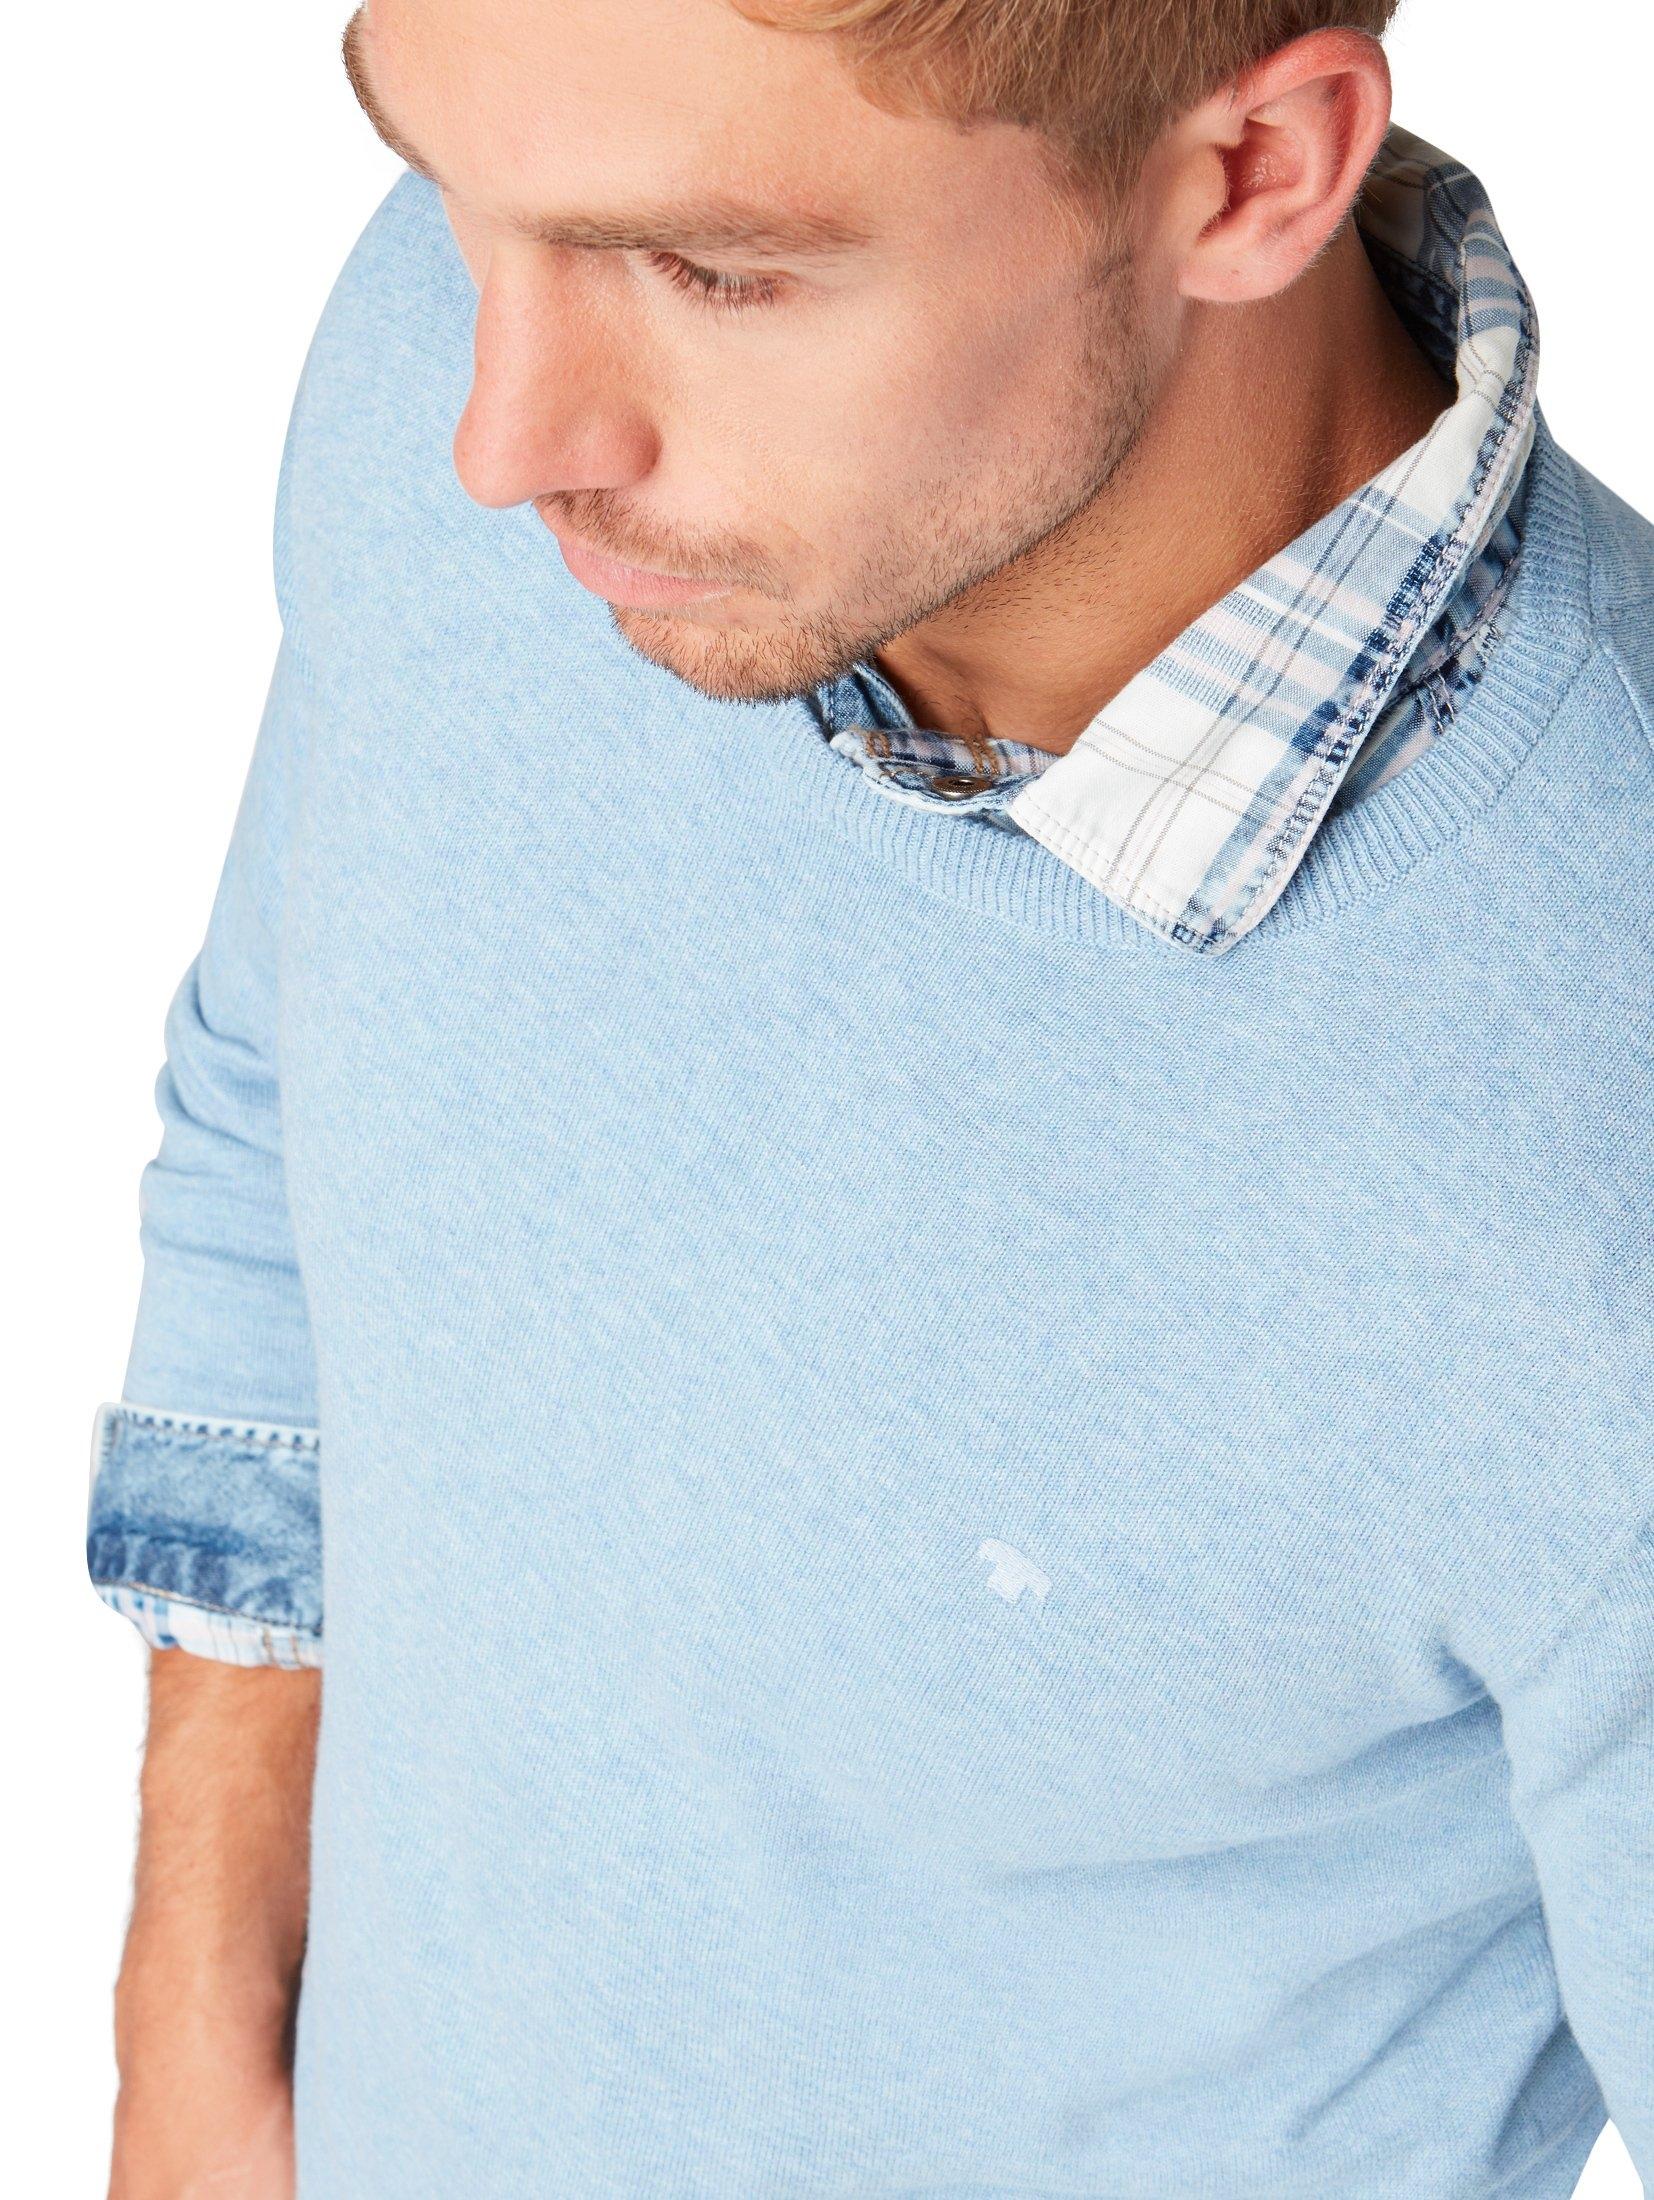 Gebreide Truigemêleerde Shop Tailor Trui Tom Online rdCBoex